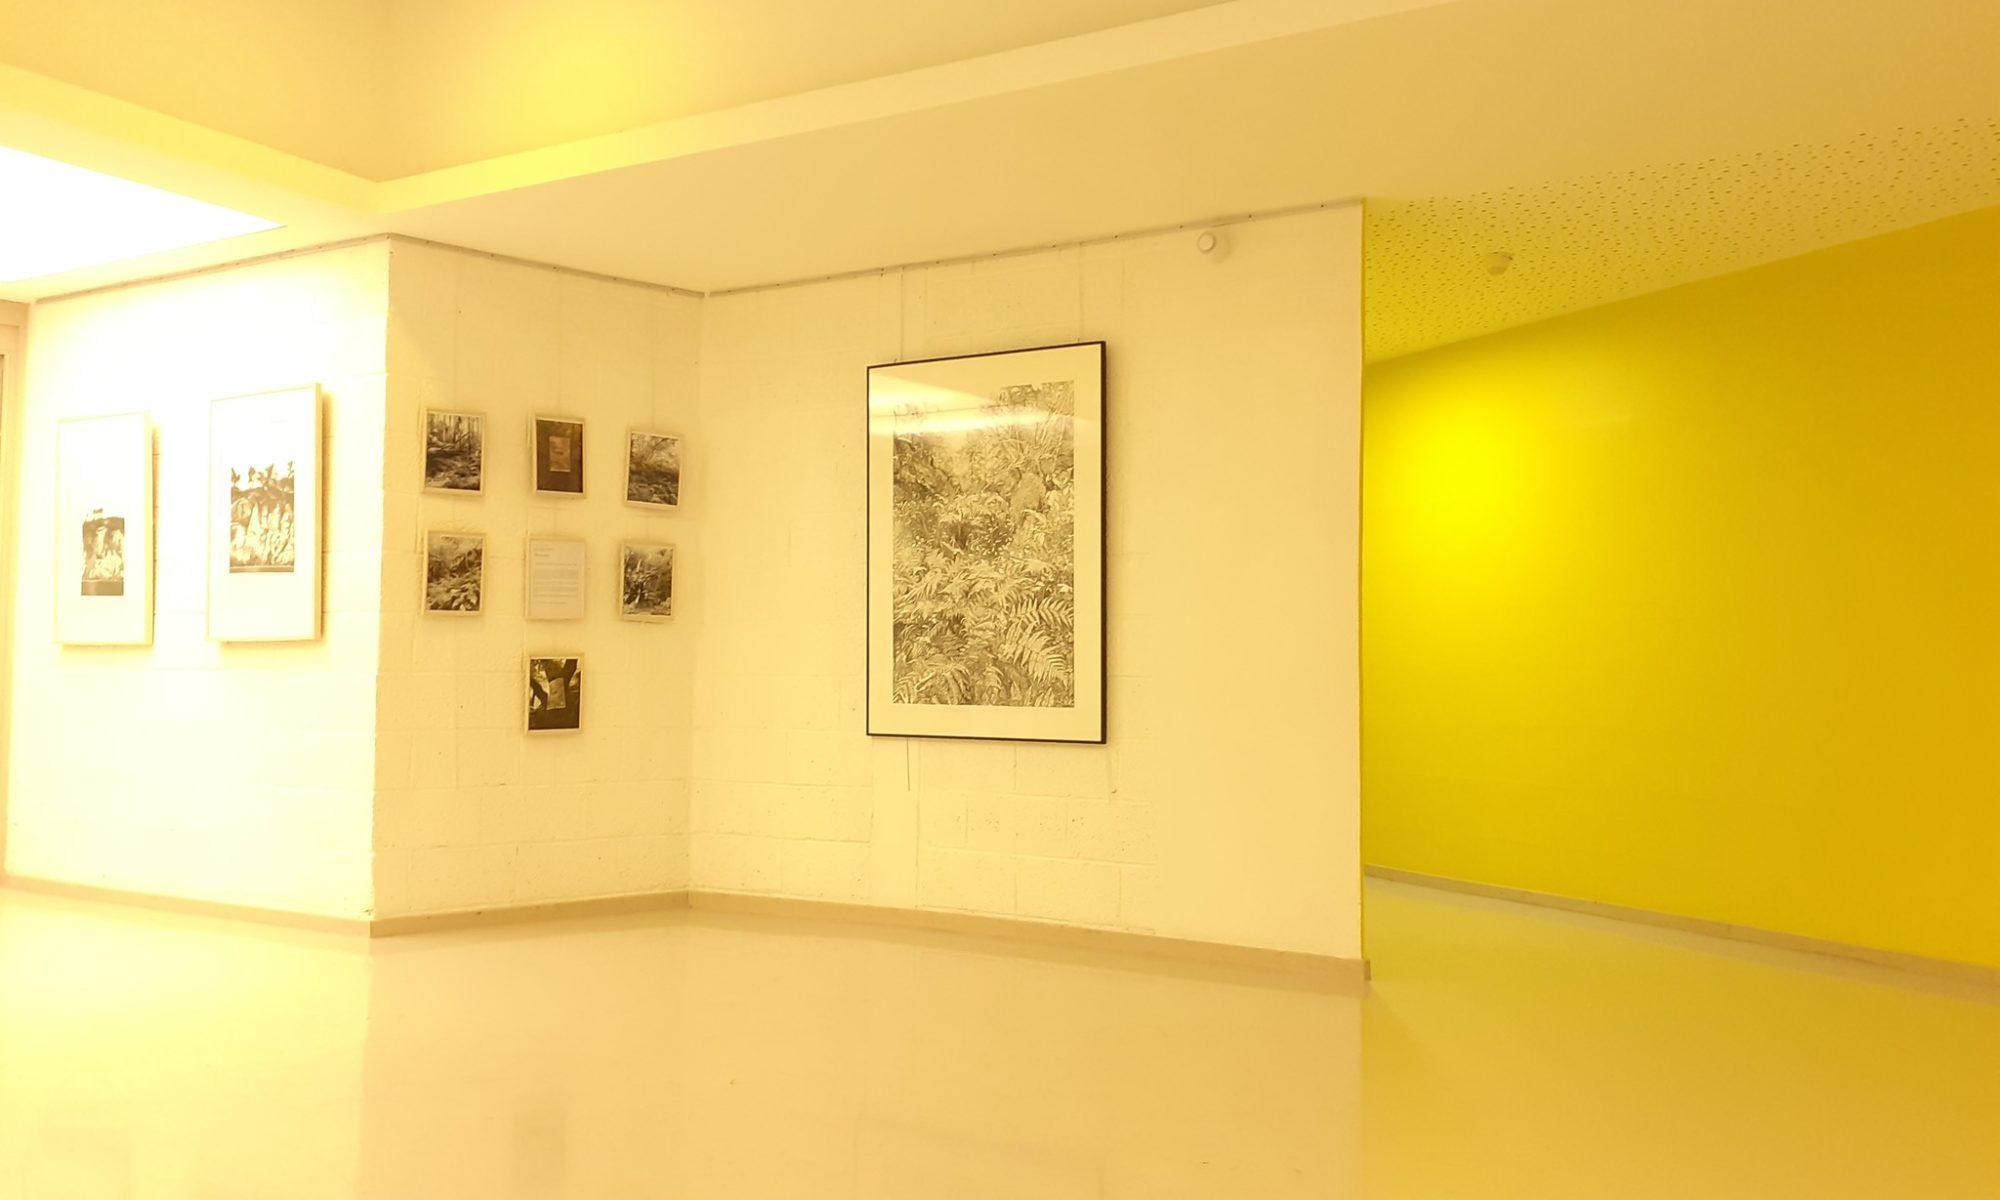 Emmanuel Henninger, aronde, riedisheim, exposition